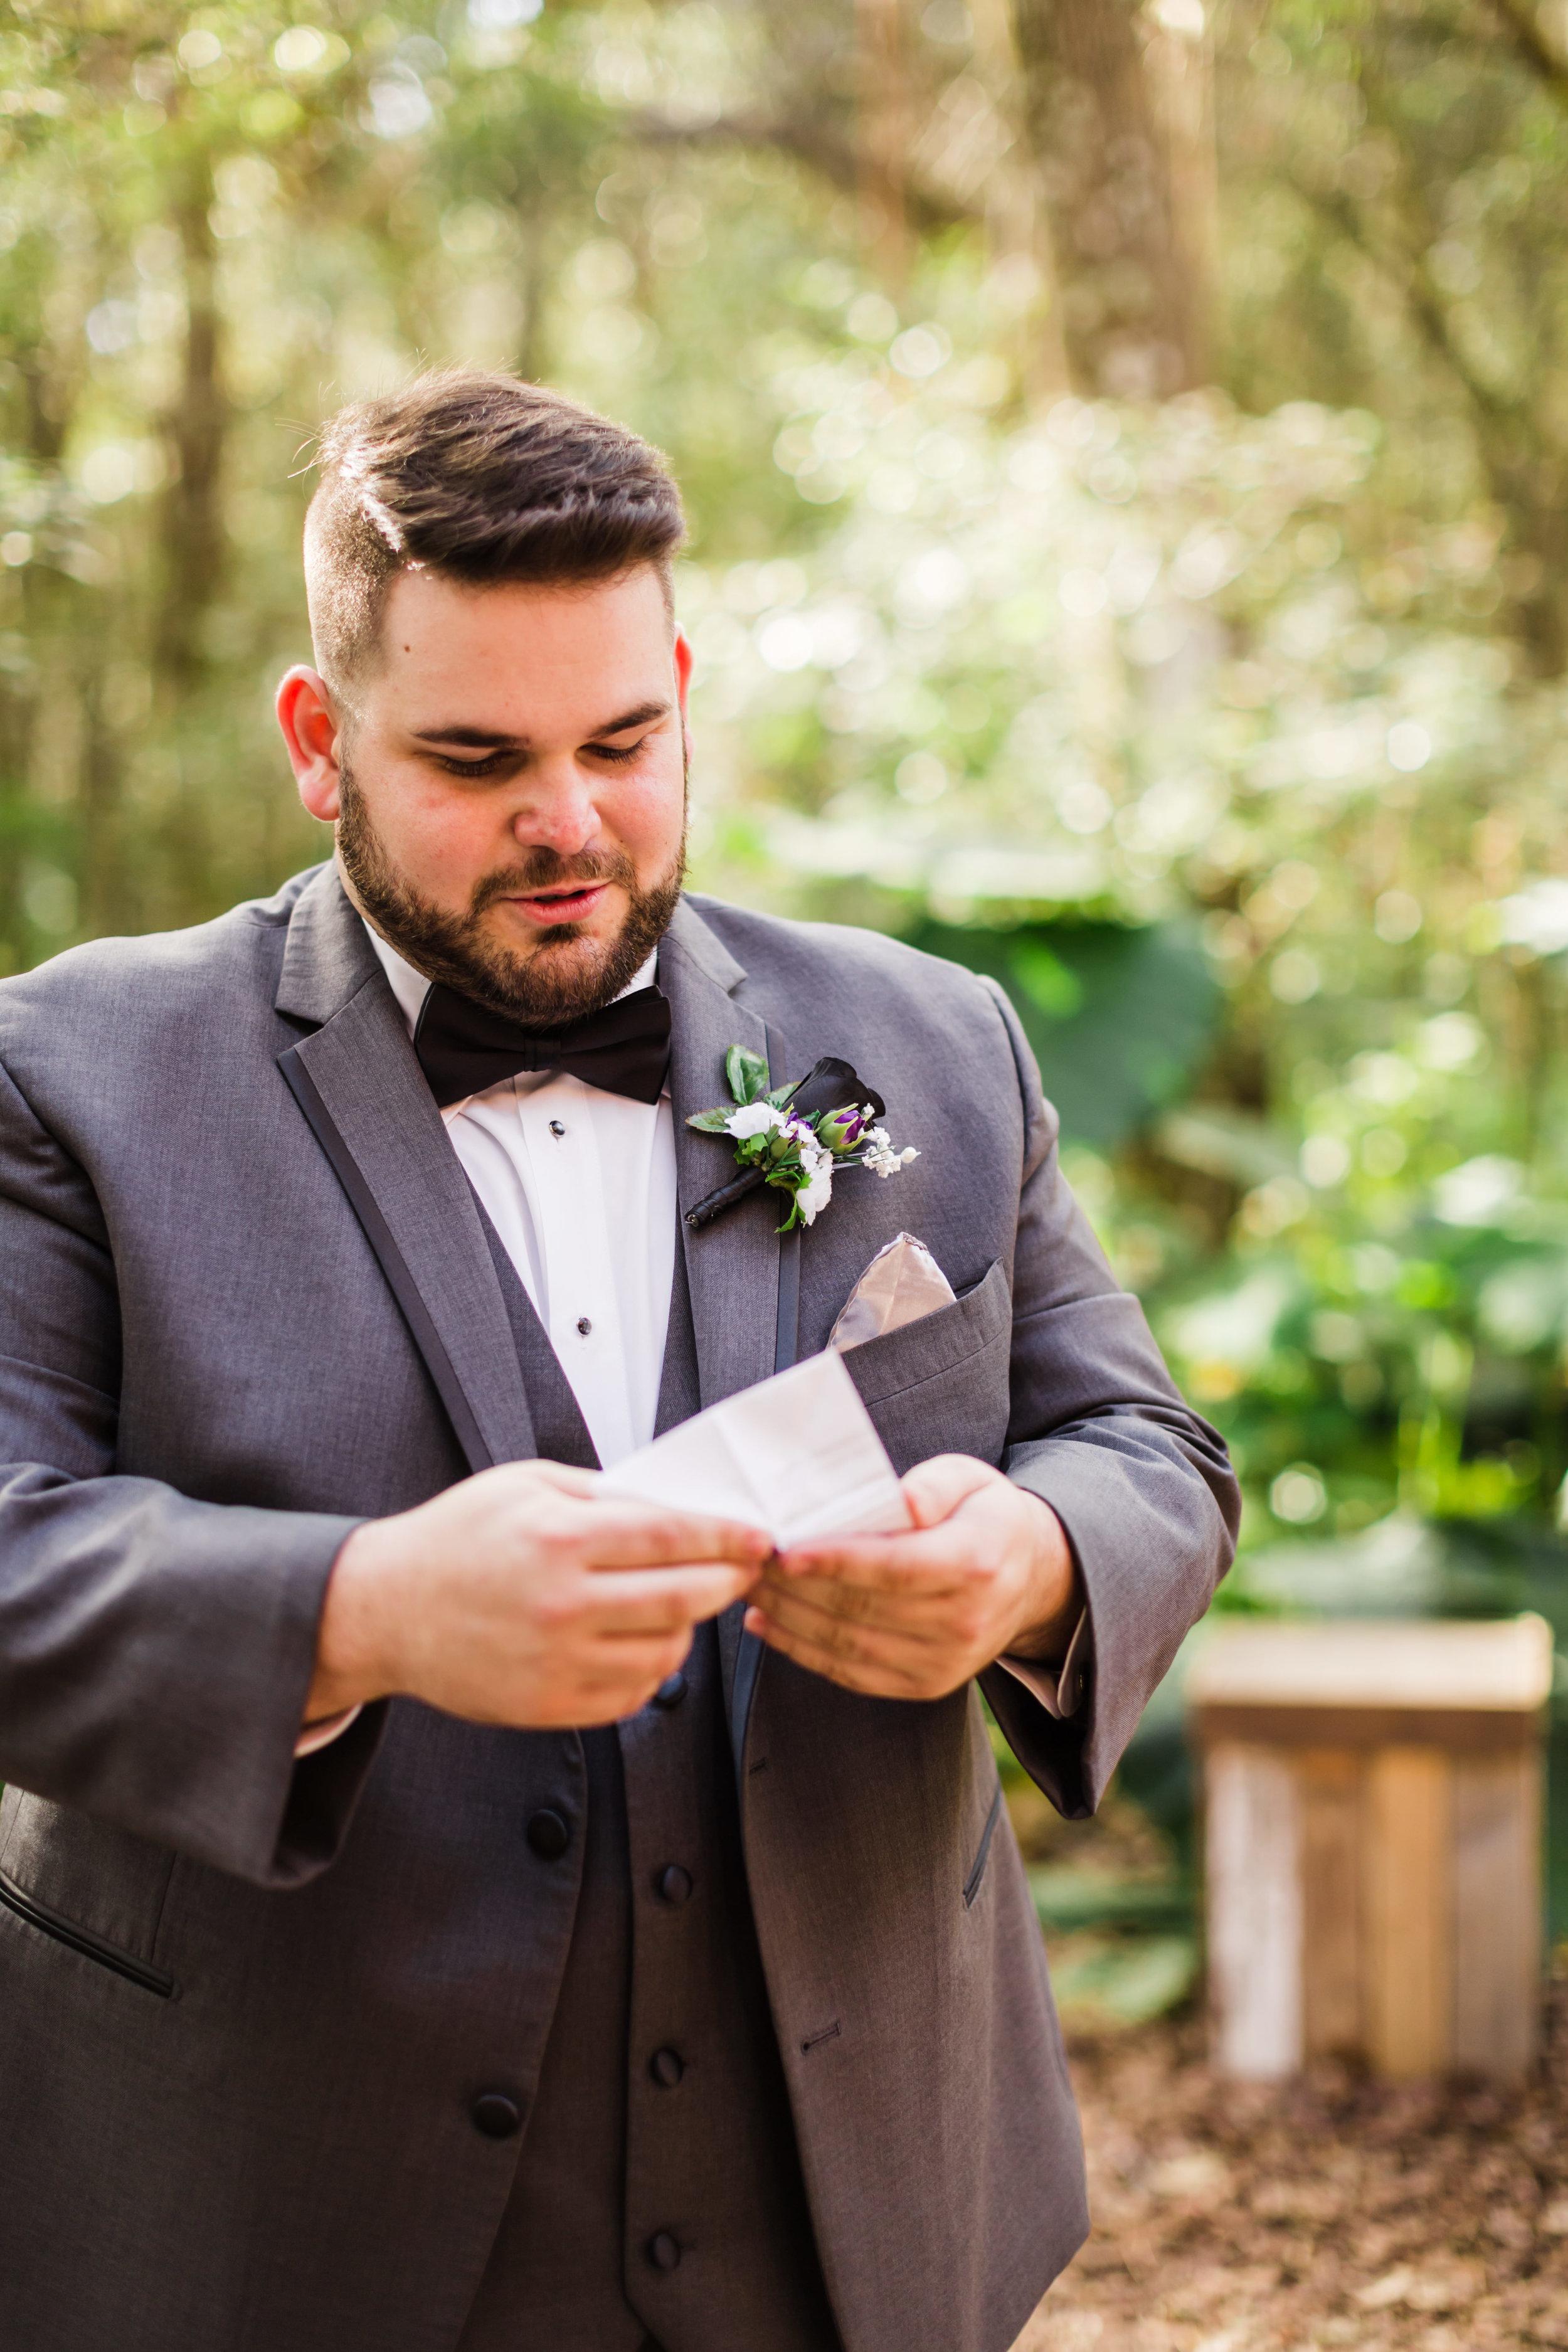 2019.01.12 Ashley and Nathan Bridle Oaks Wedding (119 of 1091).jpg